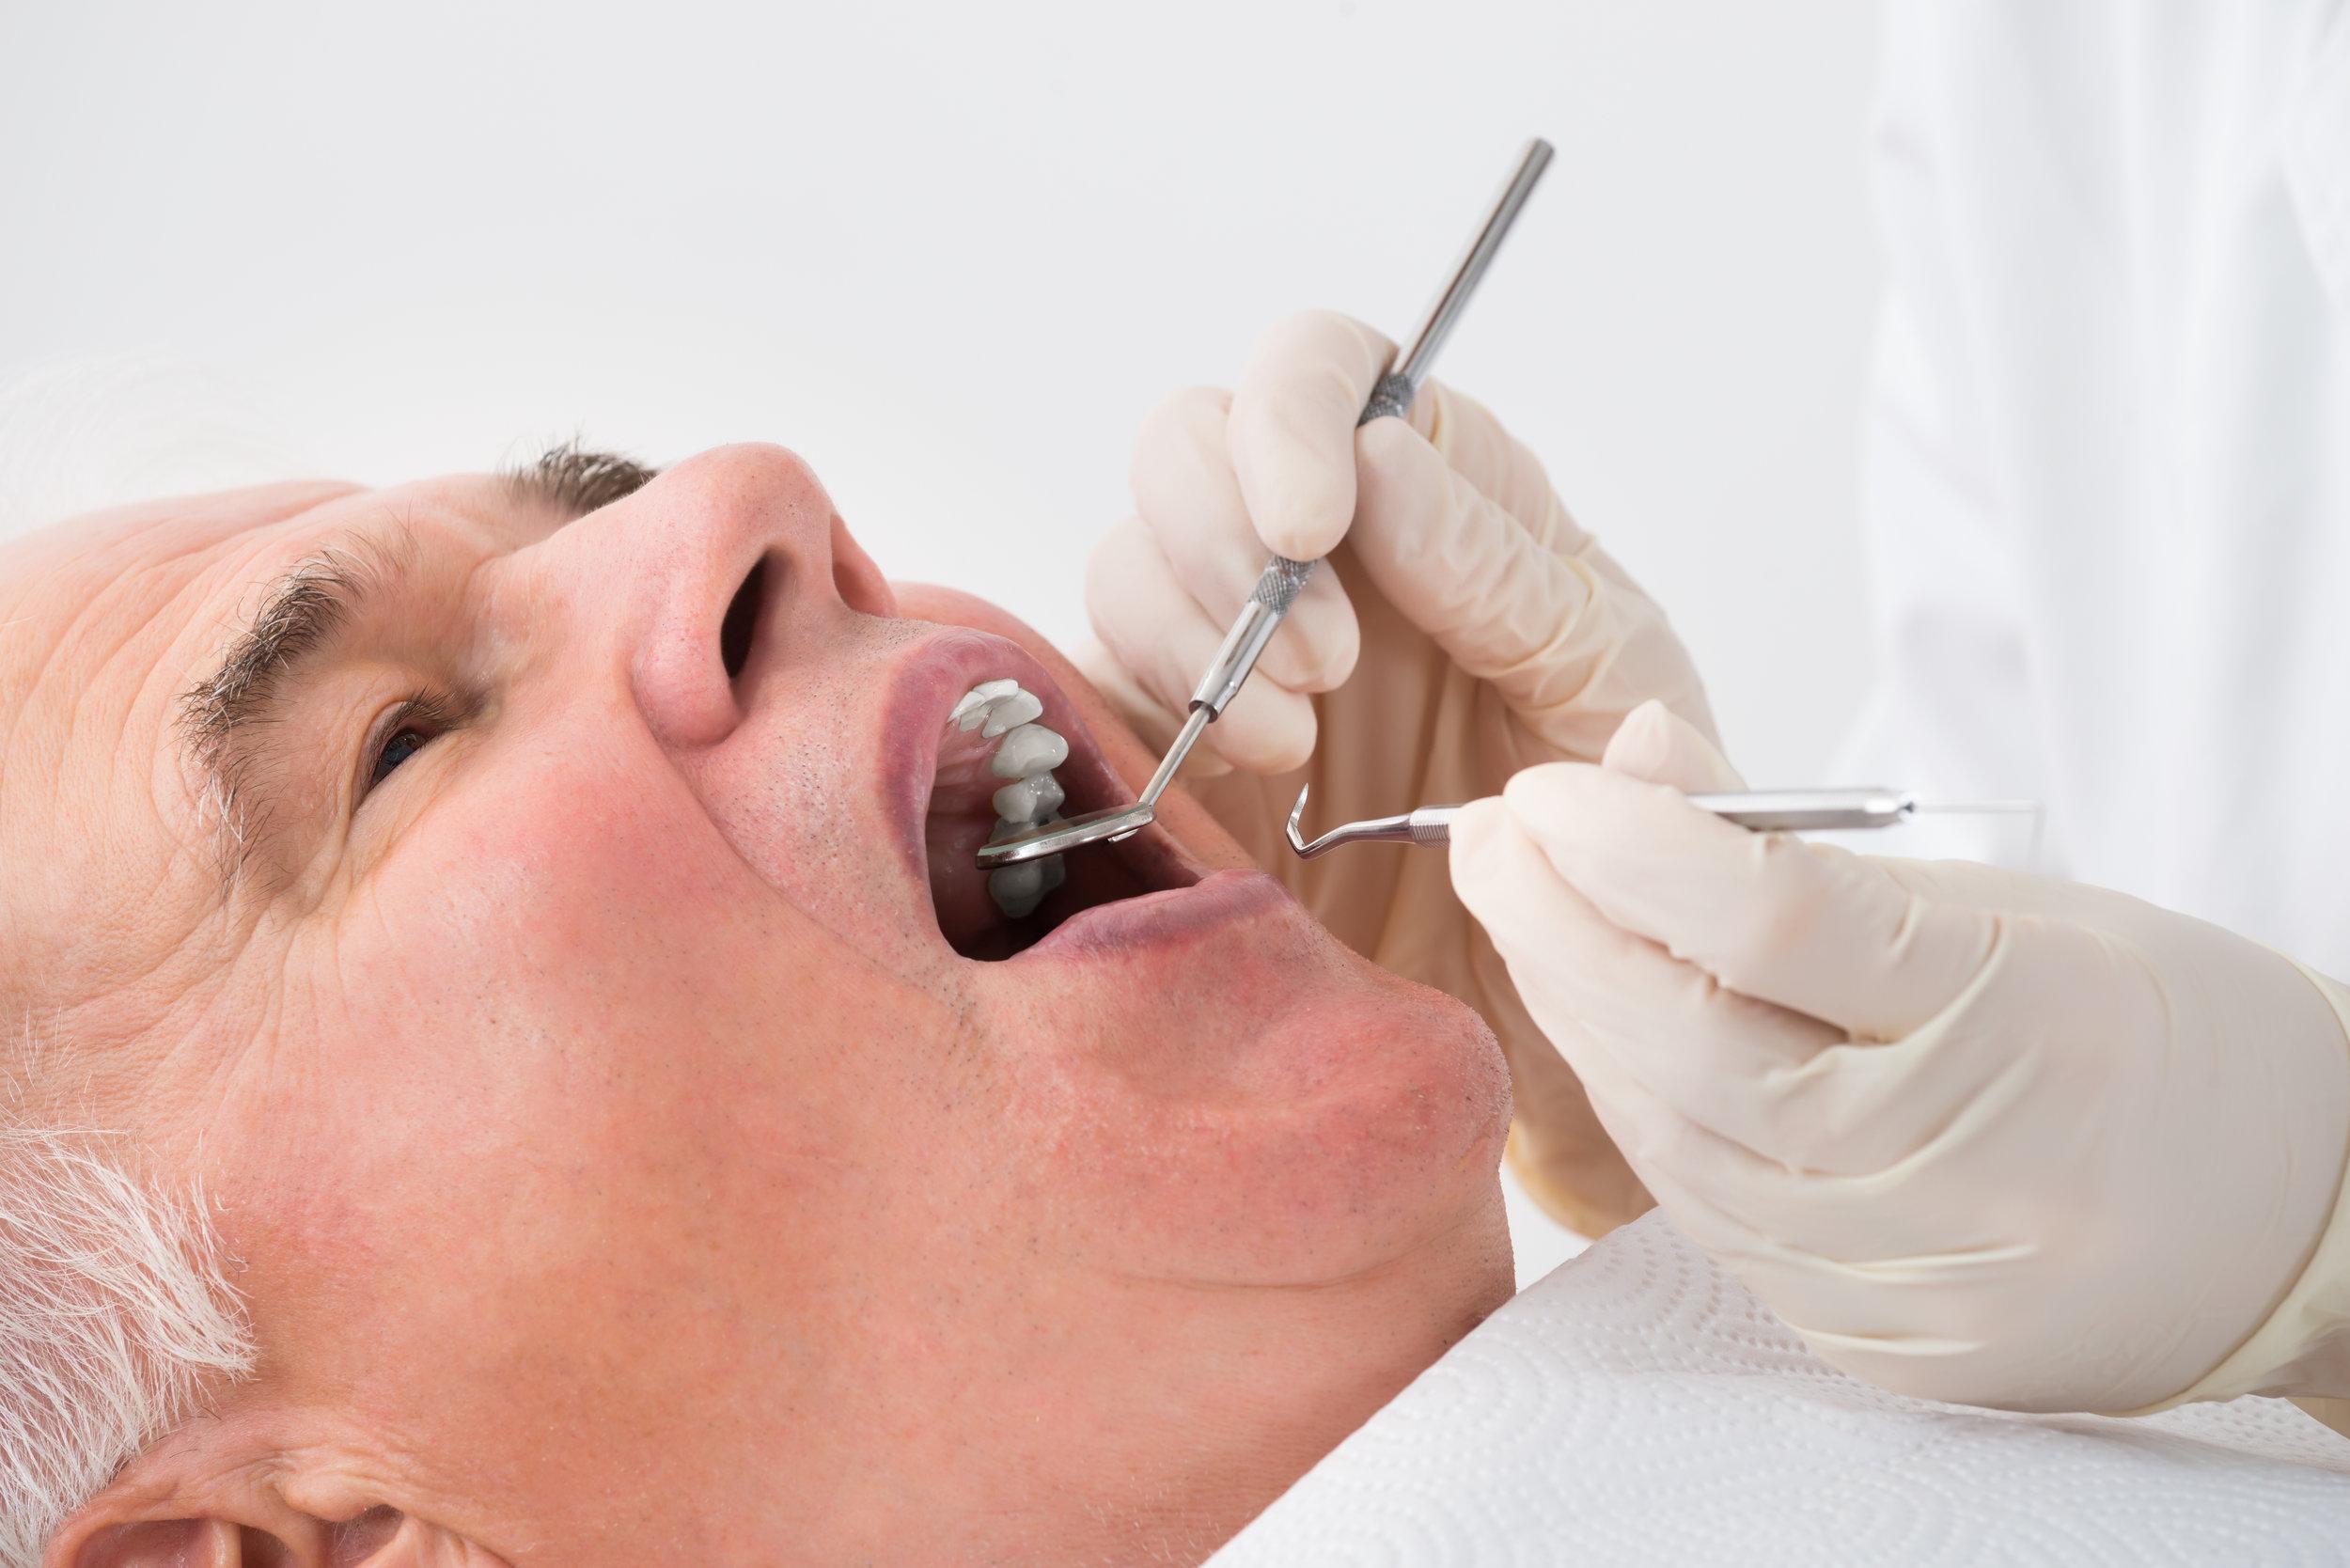 tandbehandling i polen